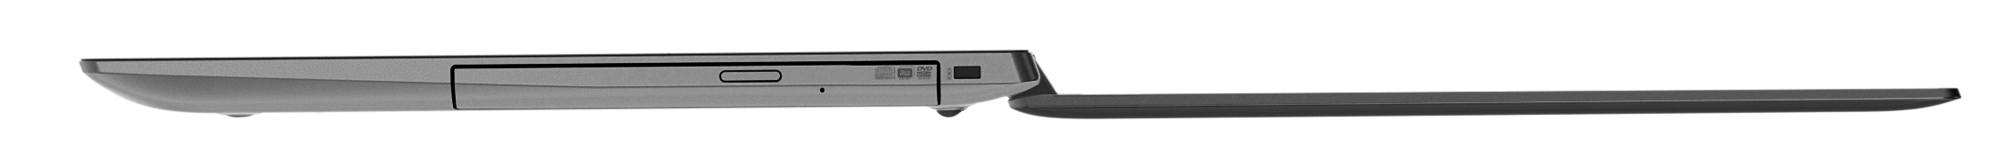 Фото  Ноутбук Lenovo ideapad 330-15 Onyx Black (81DC009WRA)